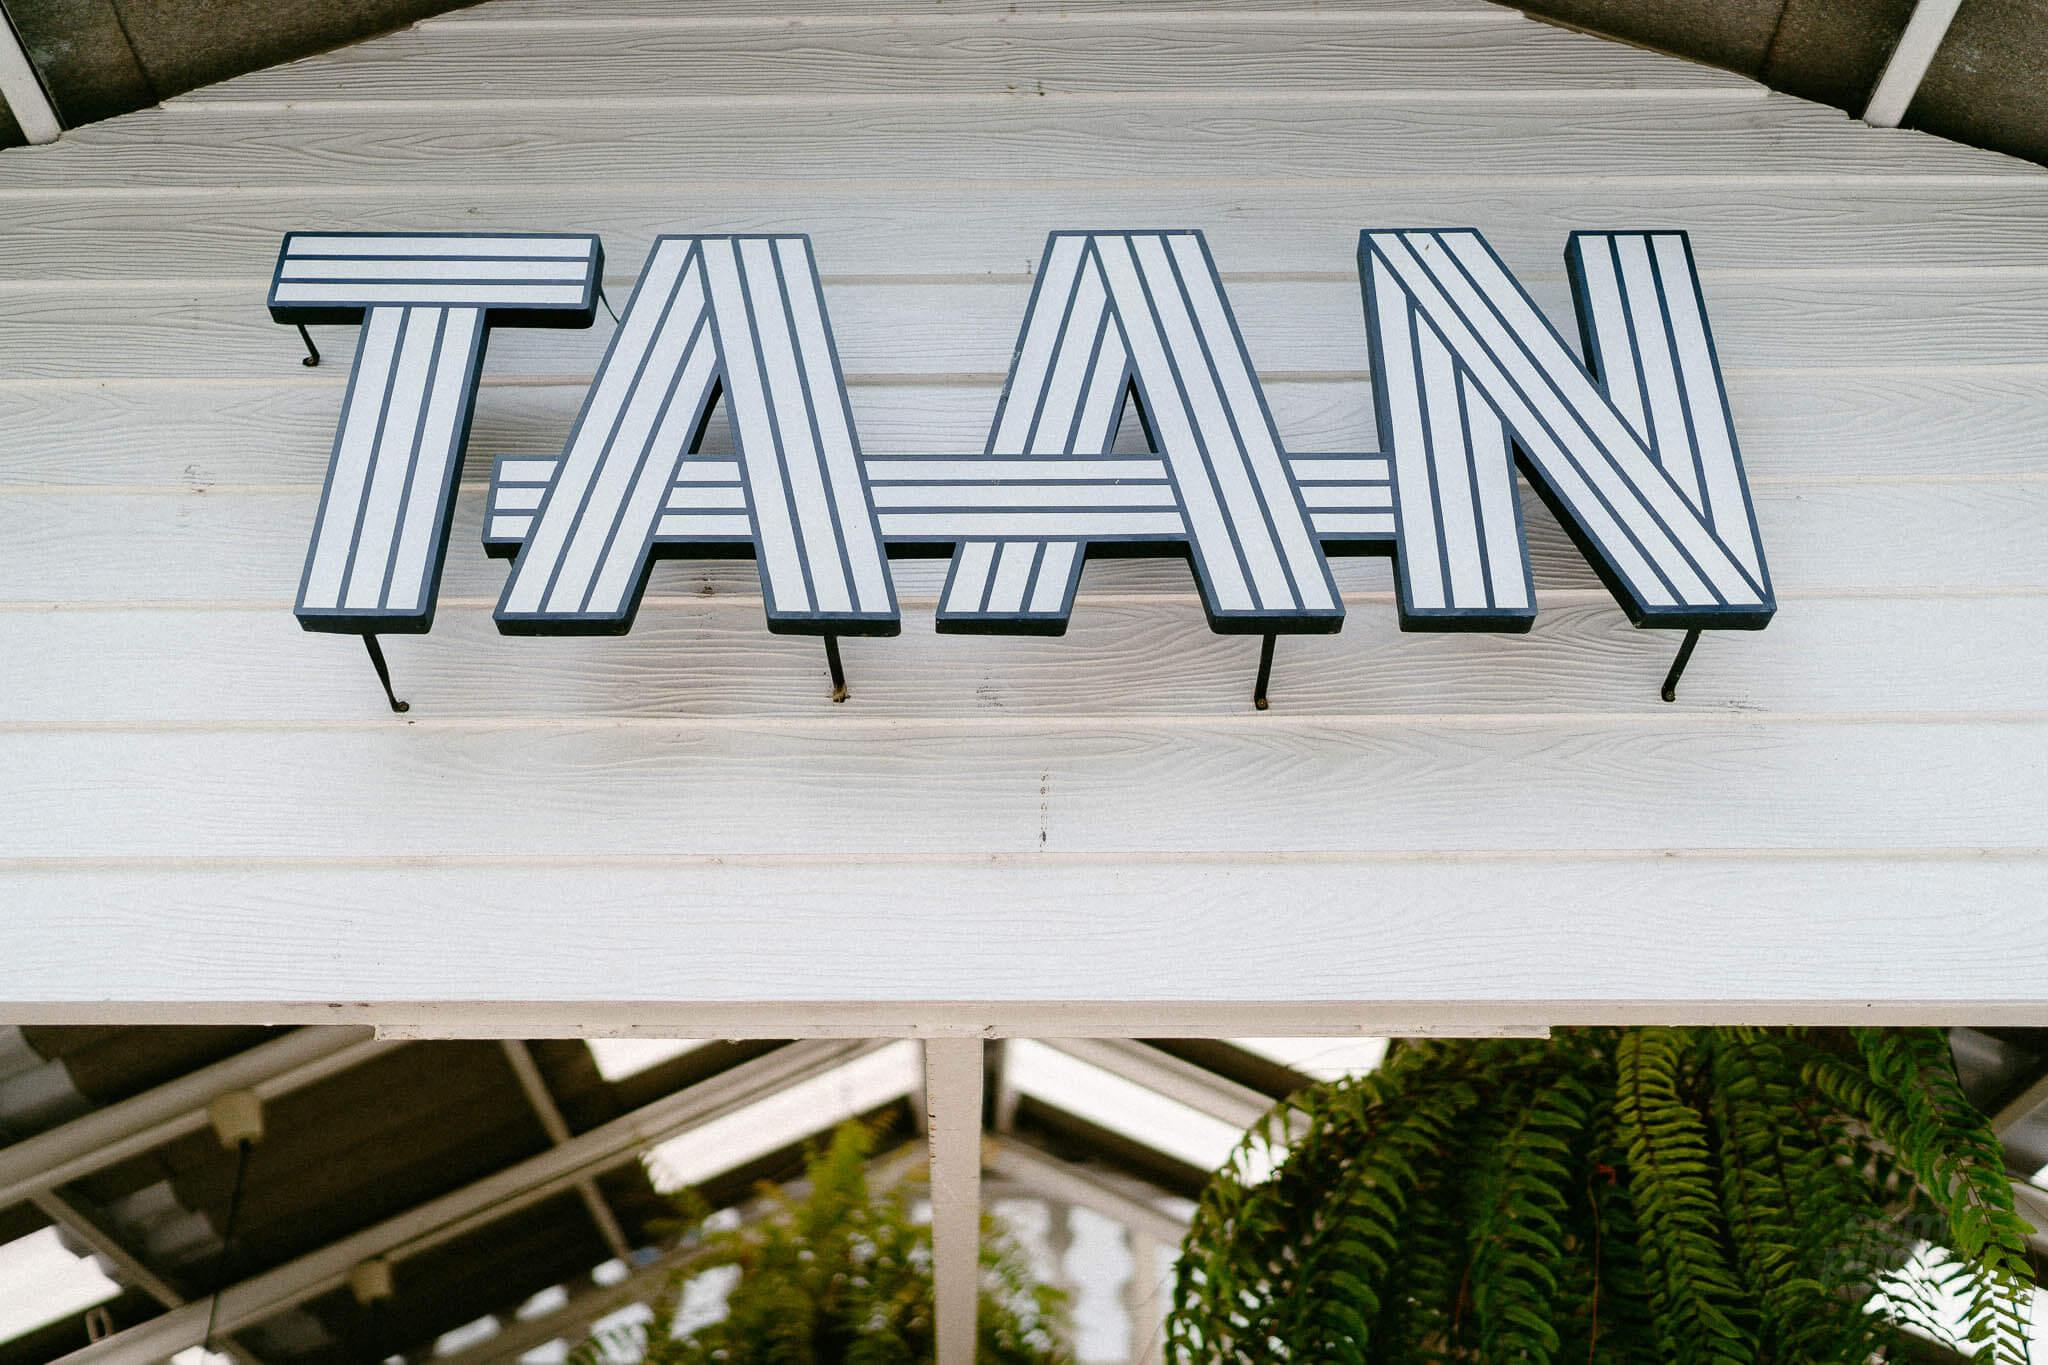 TAAN (ทาน) ORGANIC CAFE คุณทานอิ่มแค่ไหนก็จ่ายตามต้องการ 25 - cafe